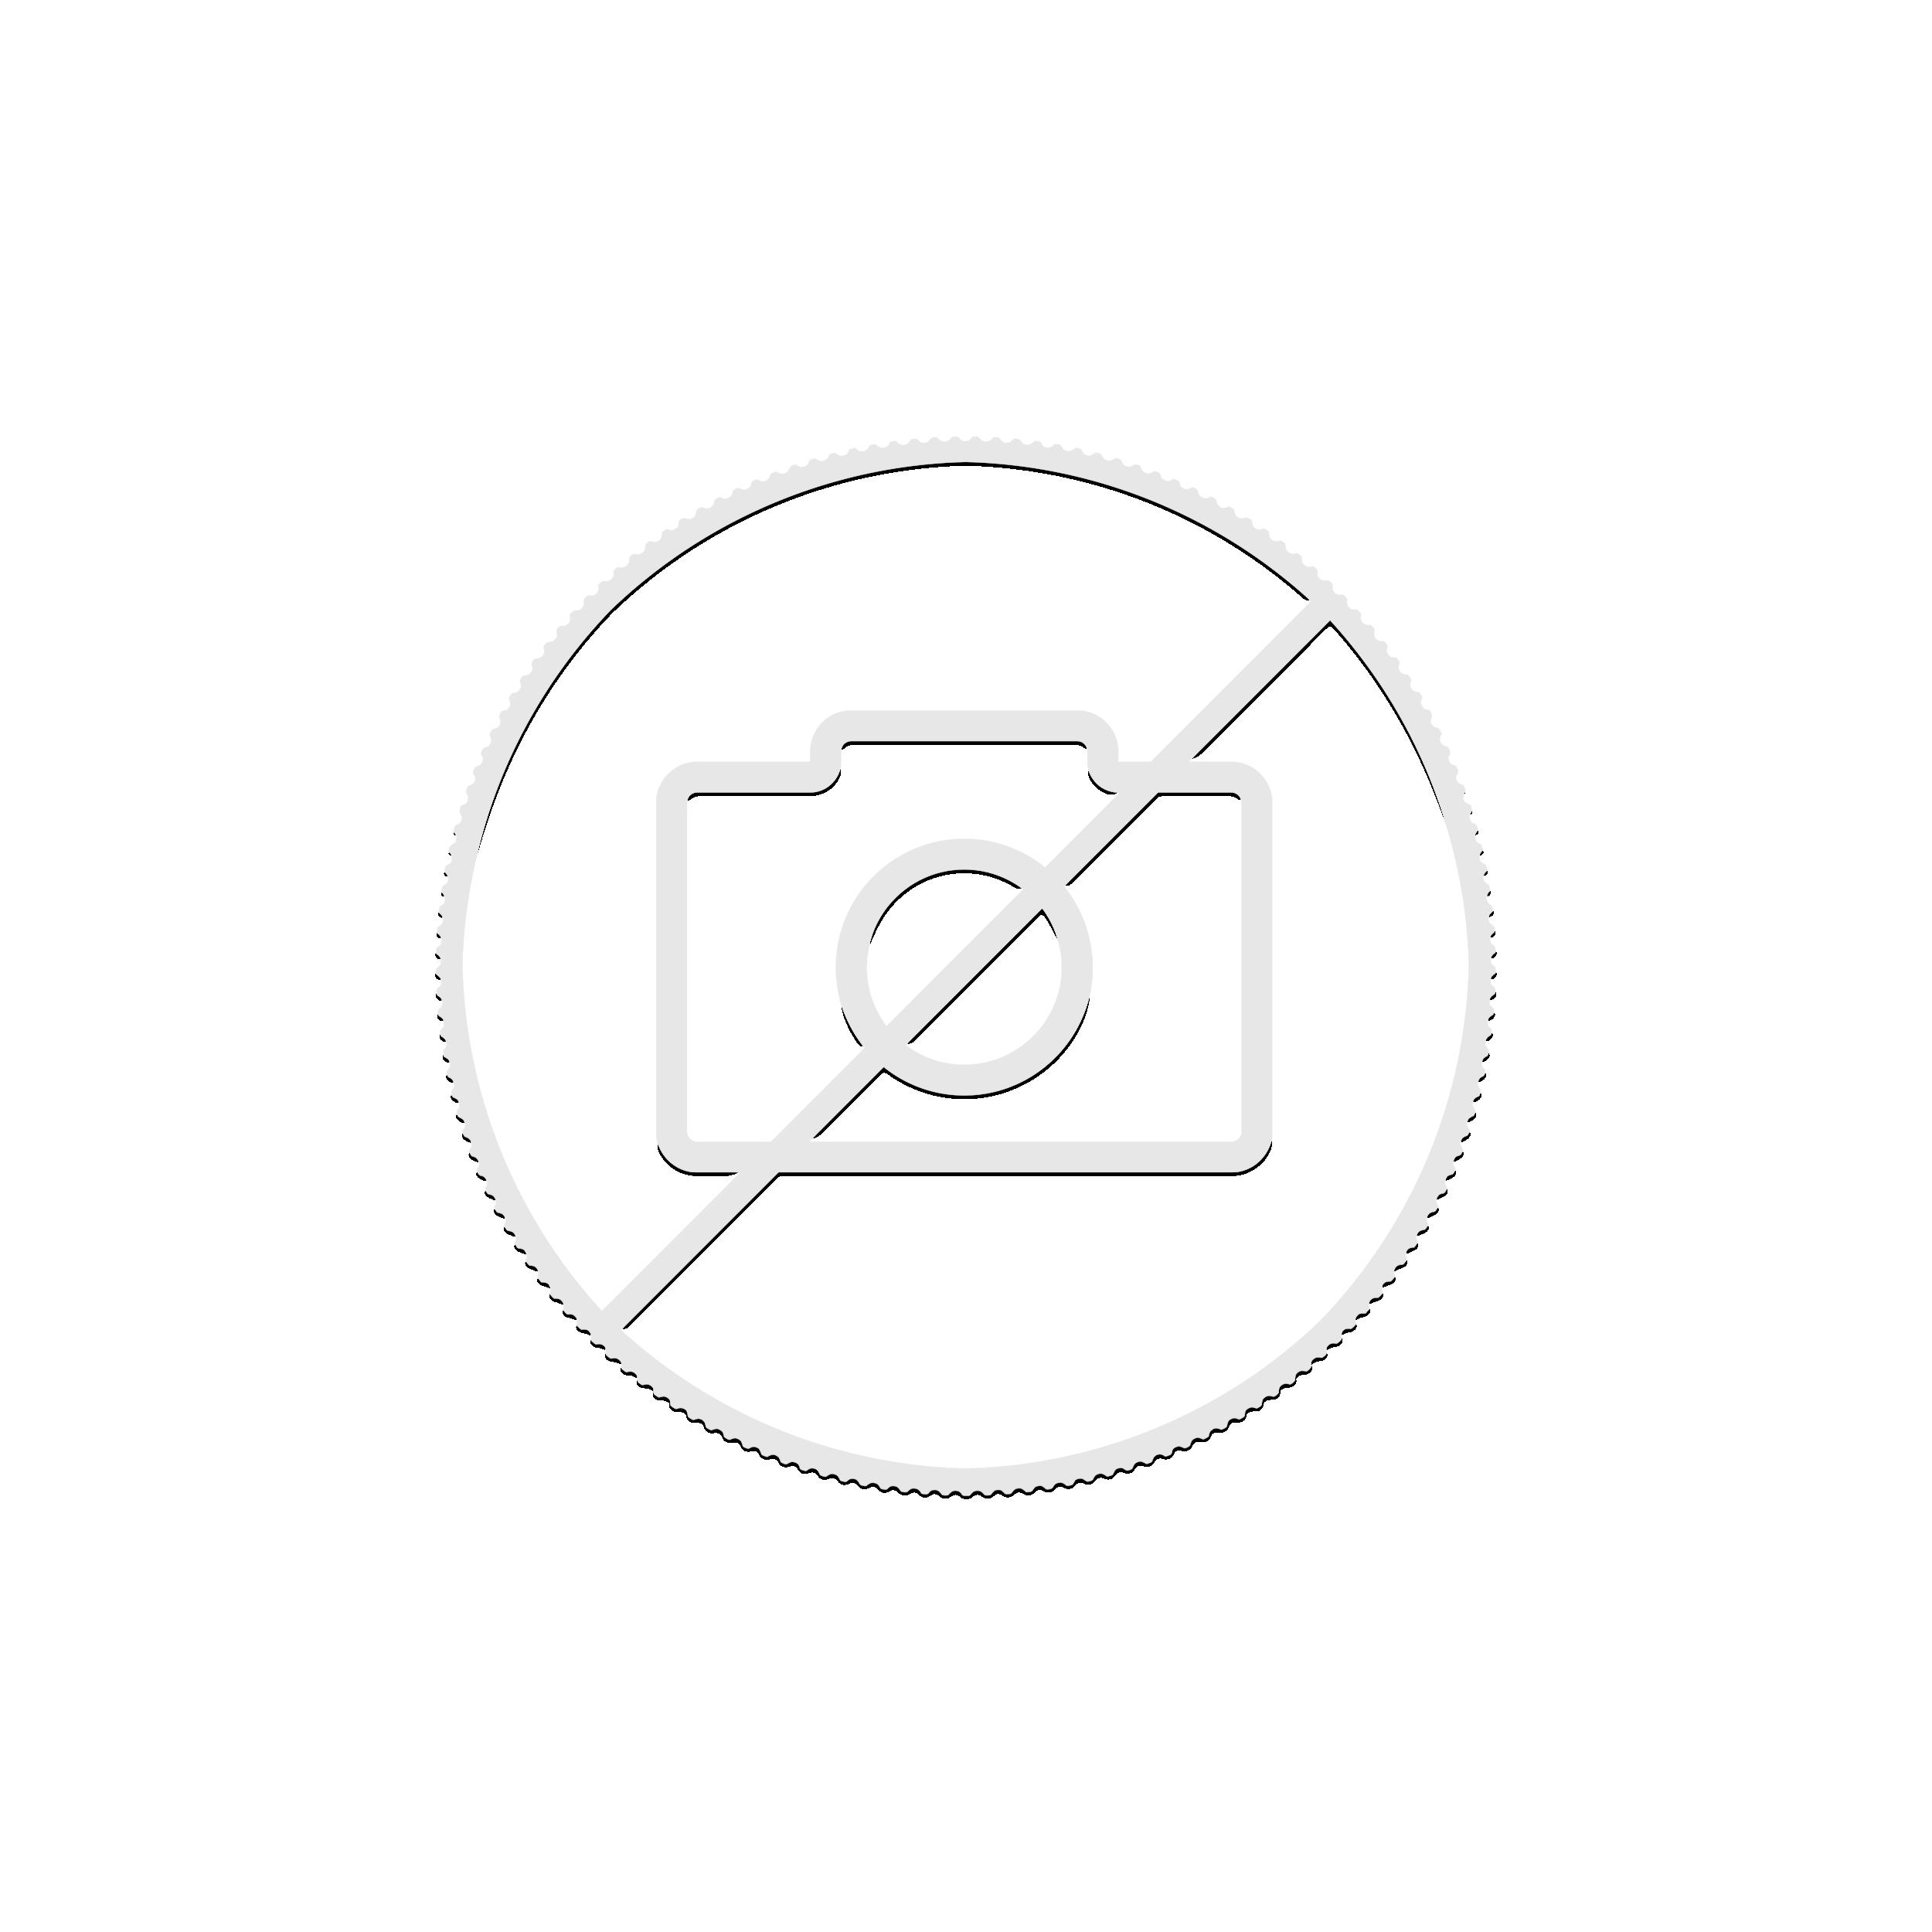 2 Troy ounce zilveren munt Mexican Libertad 2019